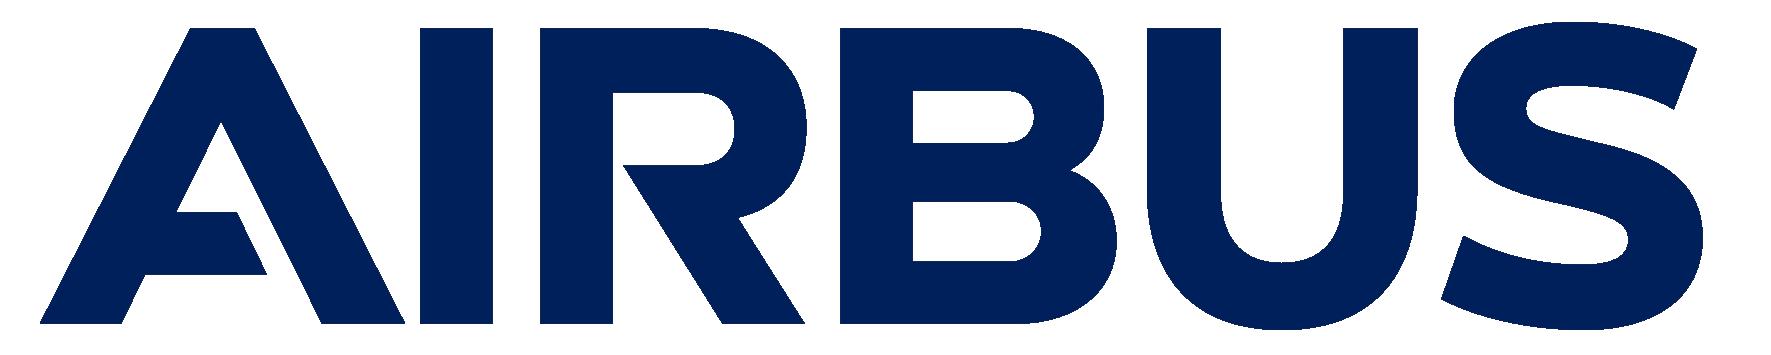 Airbus Logo Vector PNG - 97657